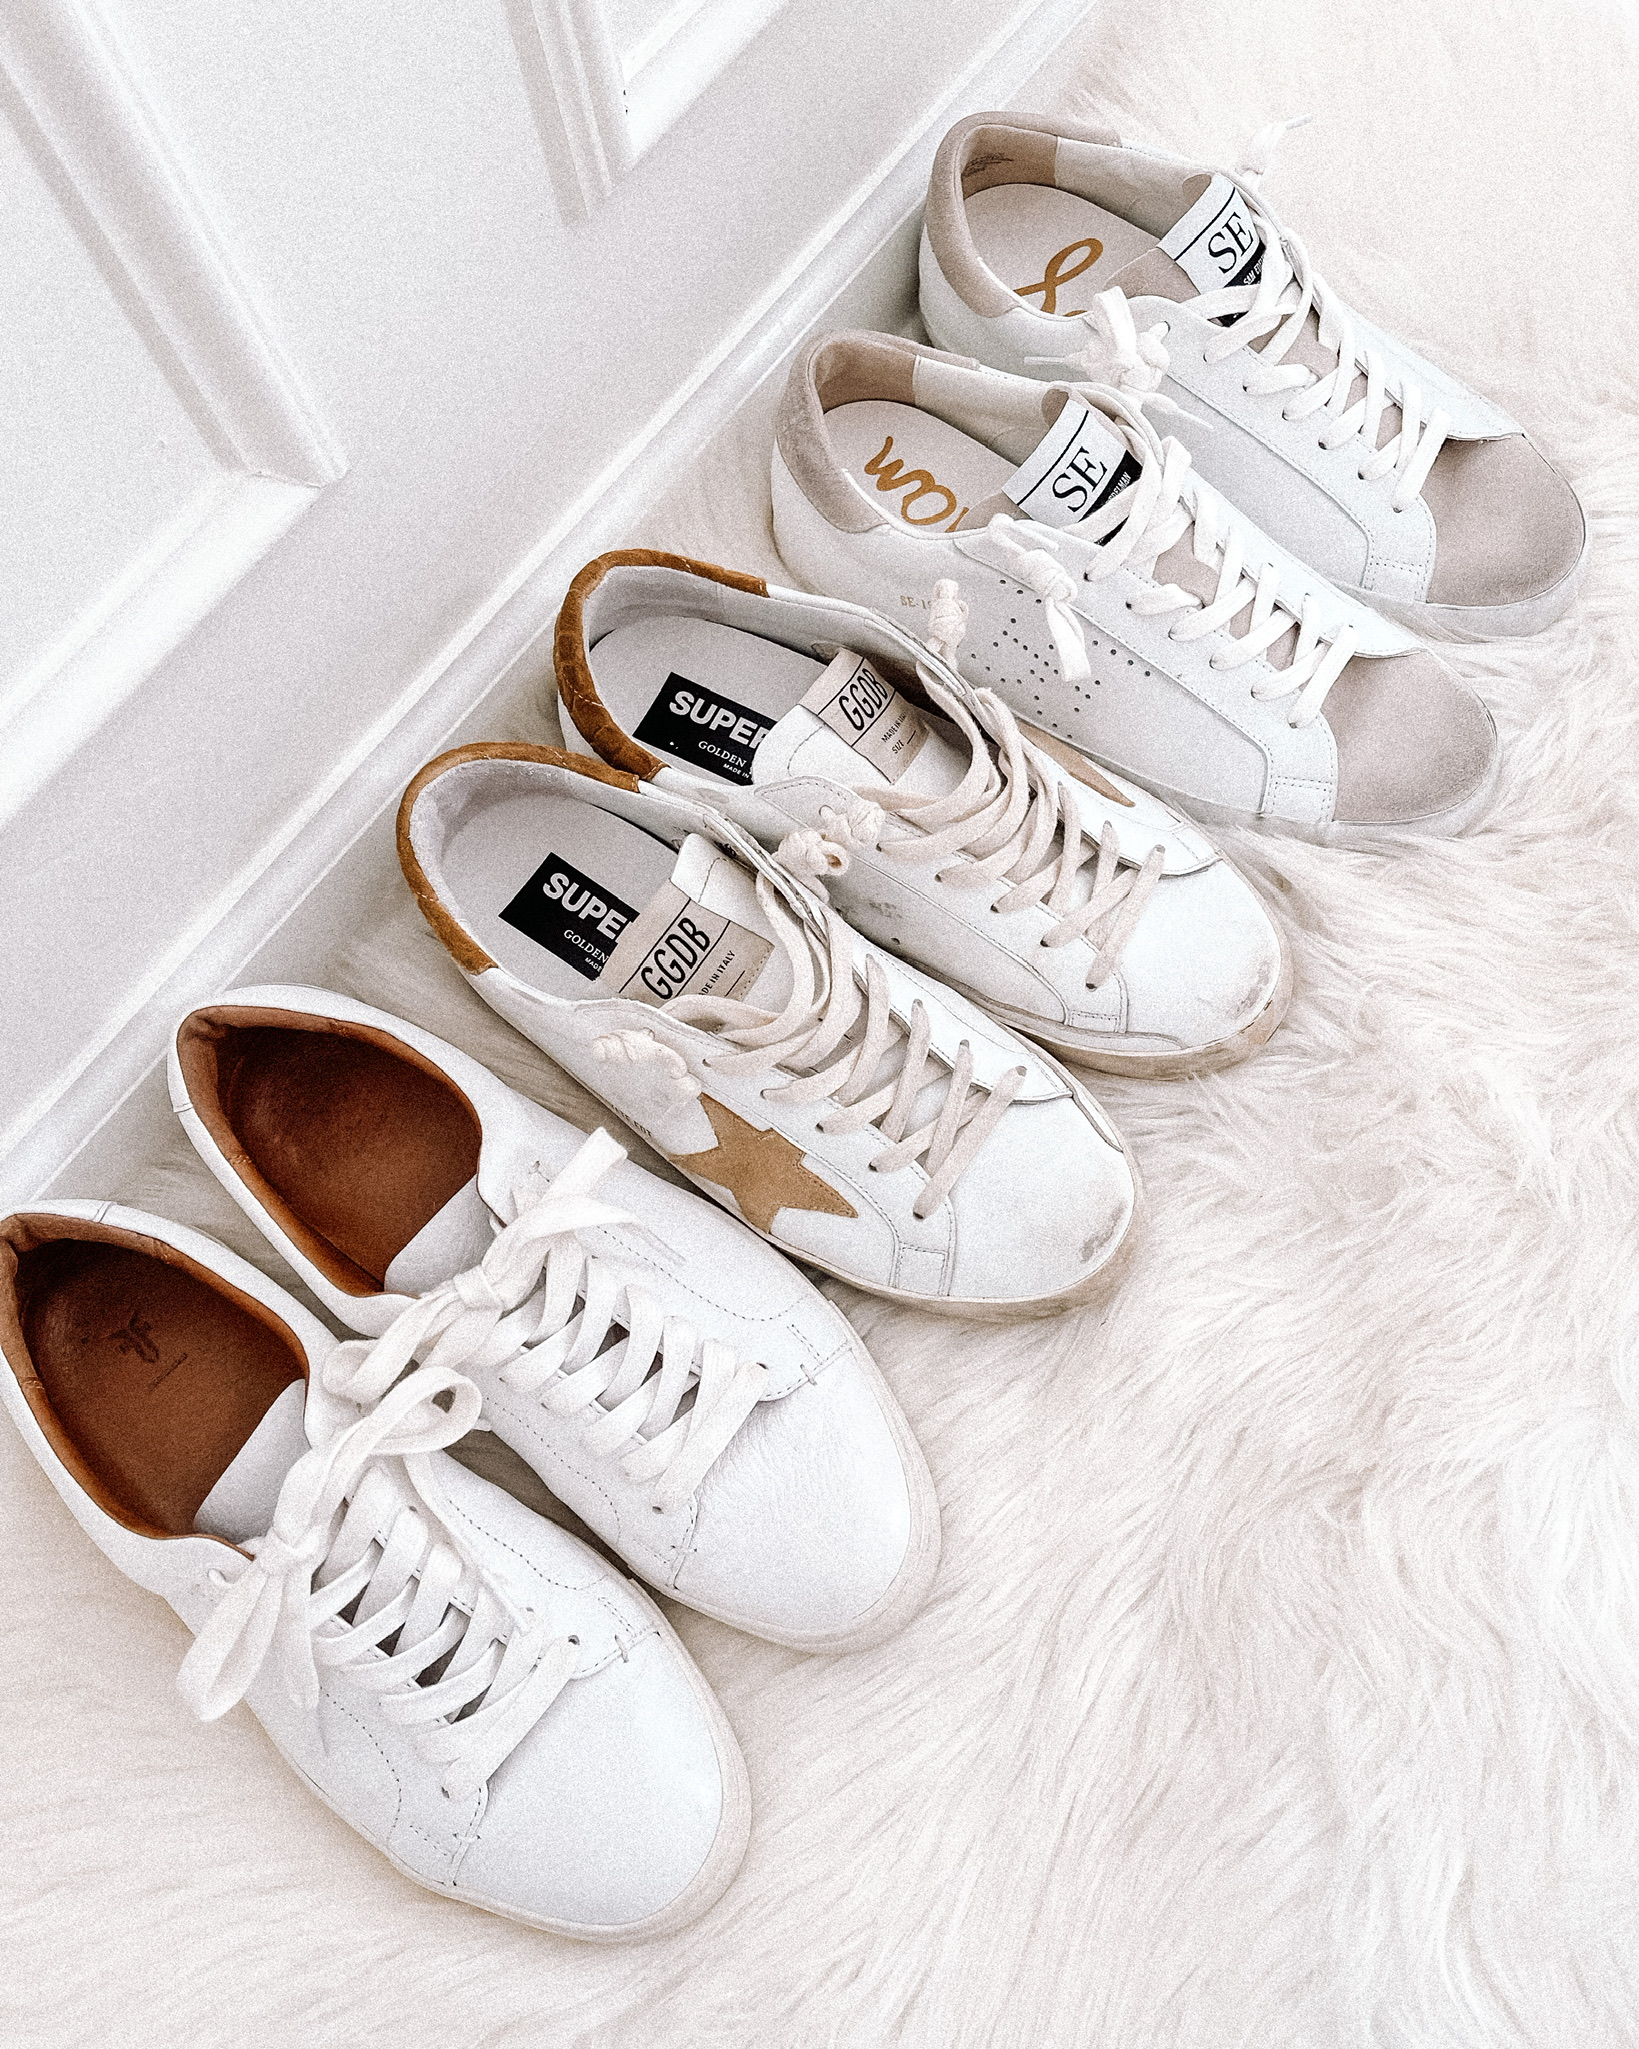 Fashion Jackson Casual White Sneakers Frye Sneakers Golden Goose Sneakers Sam Edelman Sneakers